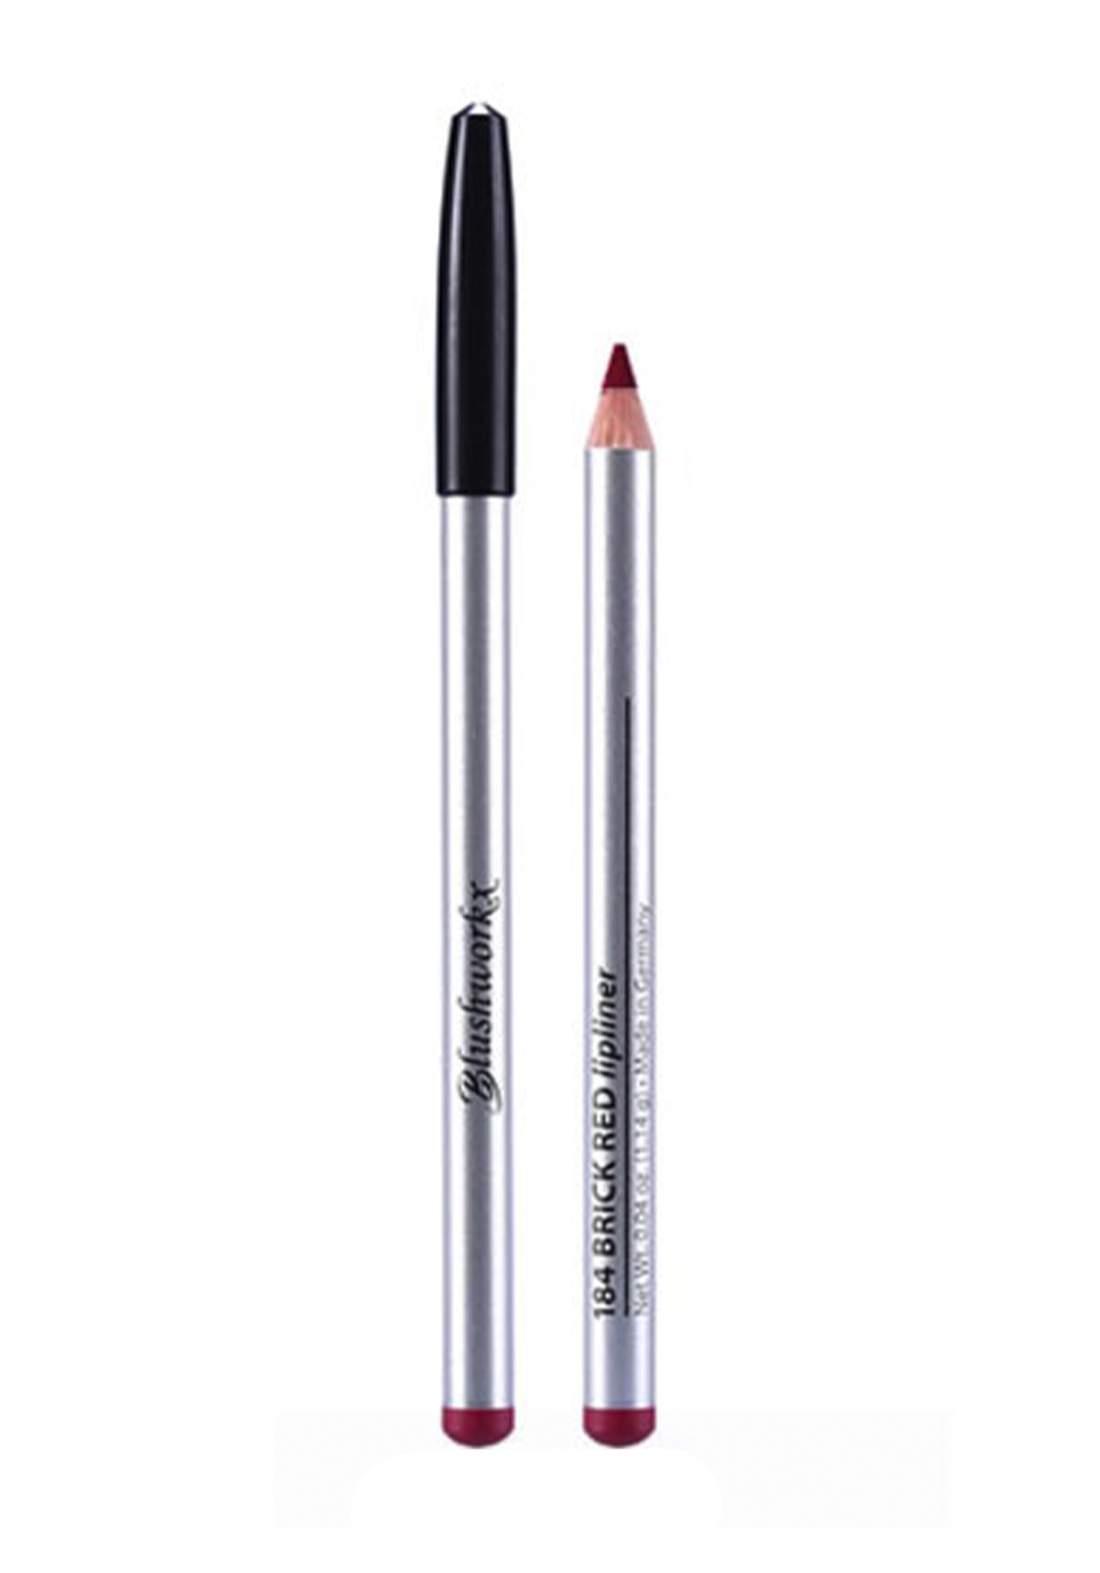 Blushworkx Hollywood Lip Liner Pencil No.184 Brick Red 1.14g محدد الشفاه